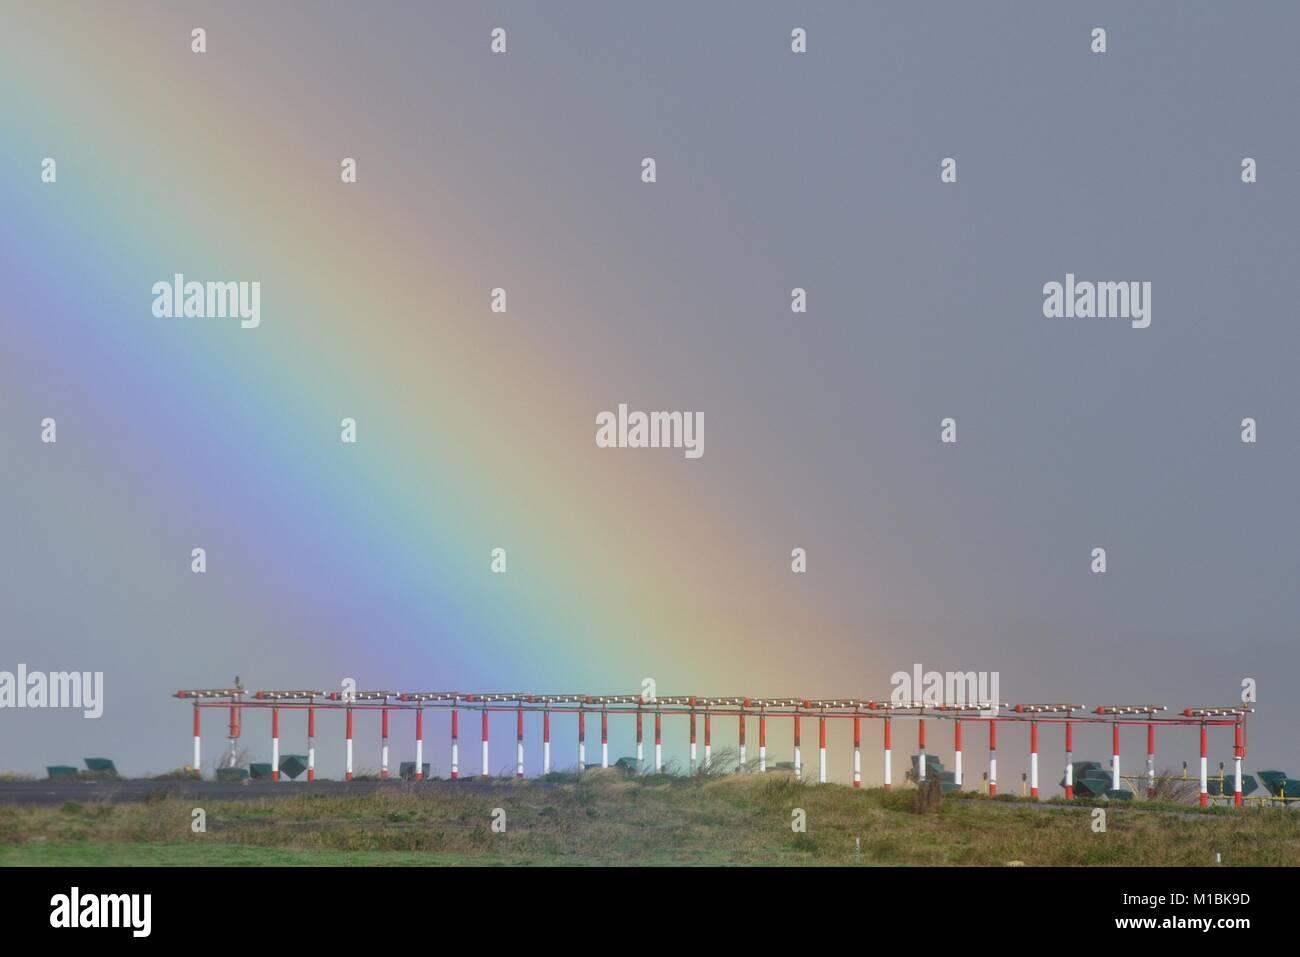 Tfn Stock Photos & Tfn Stock Images - Alamy